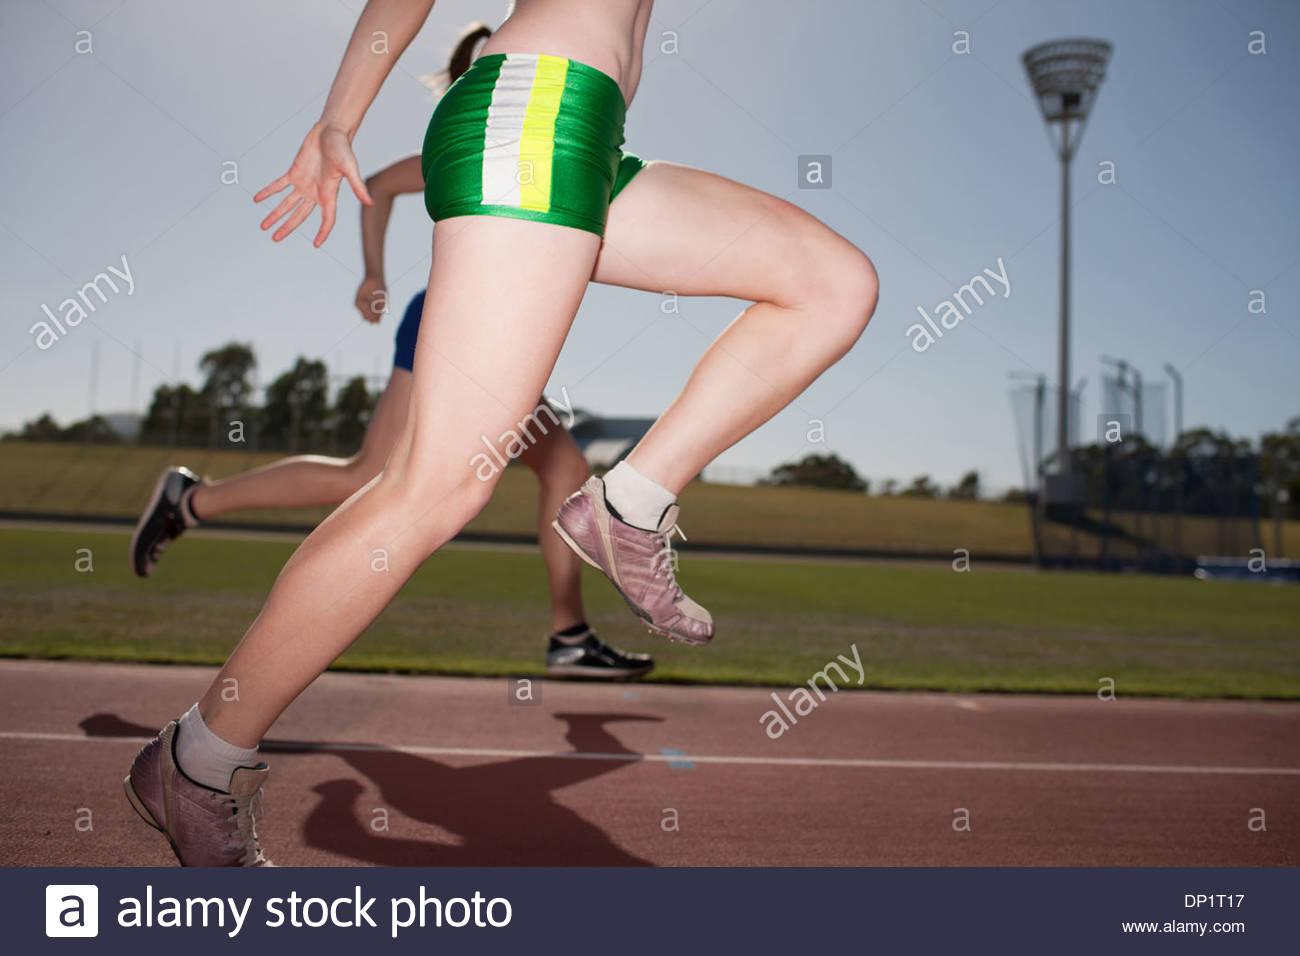 Women running on track - Stock Image